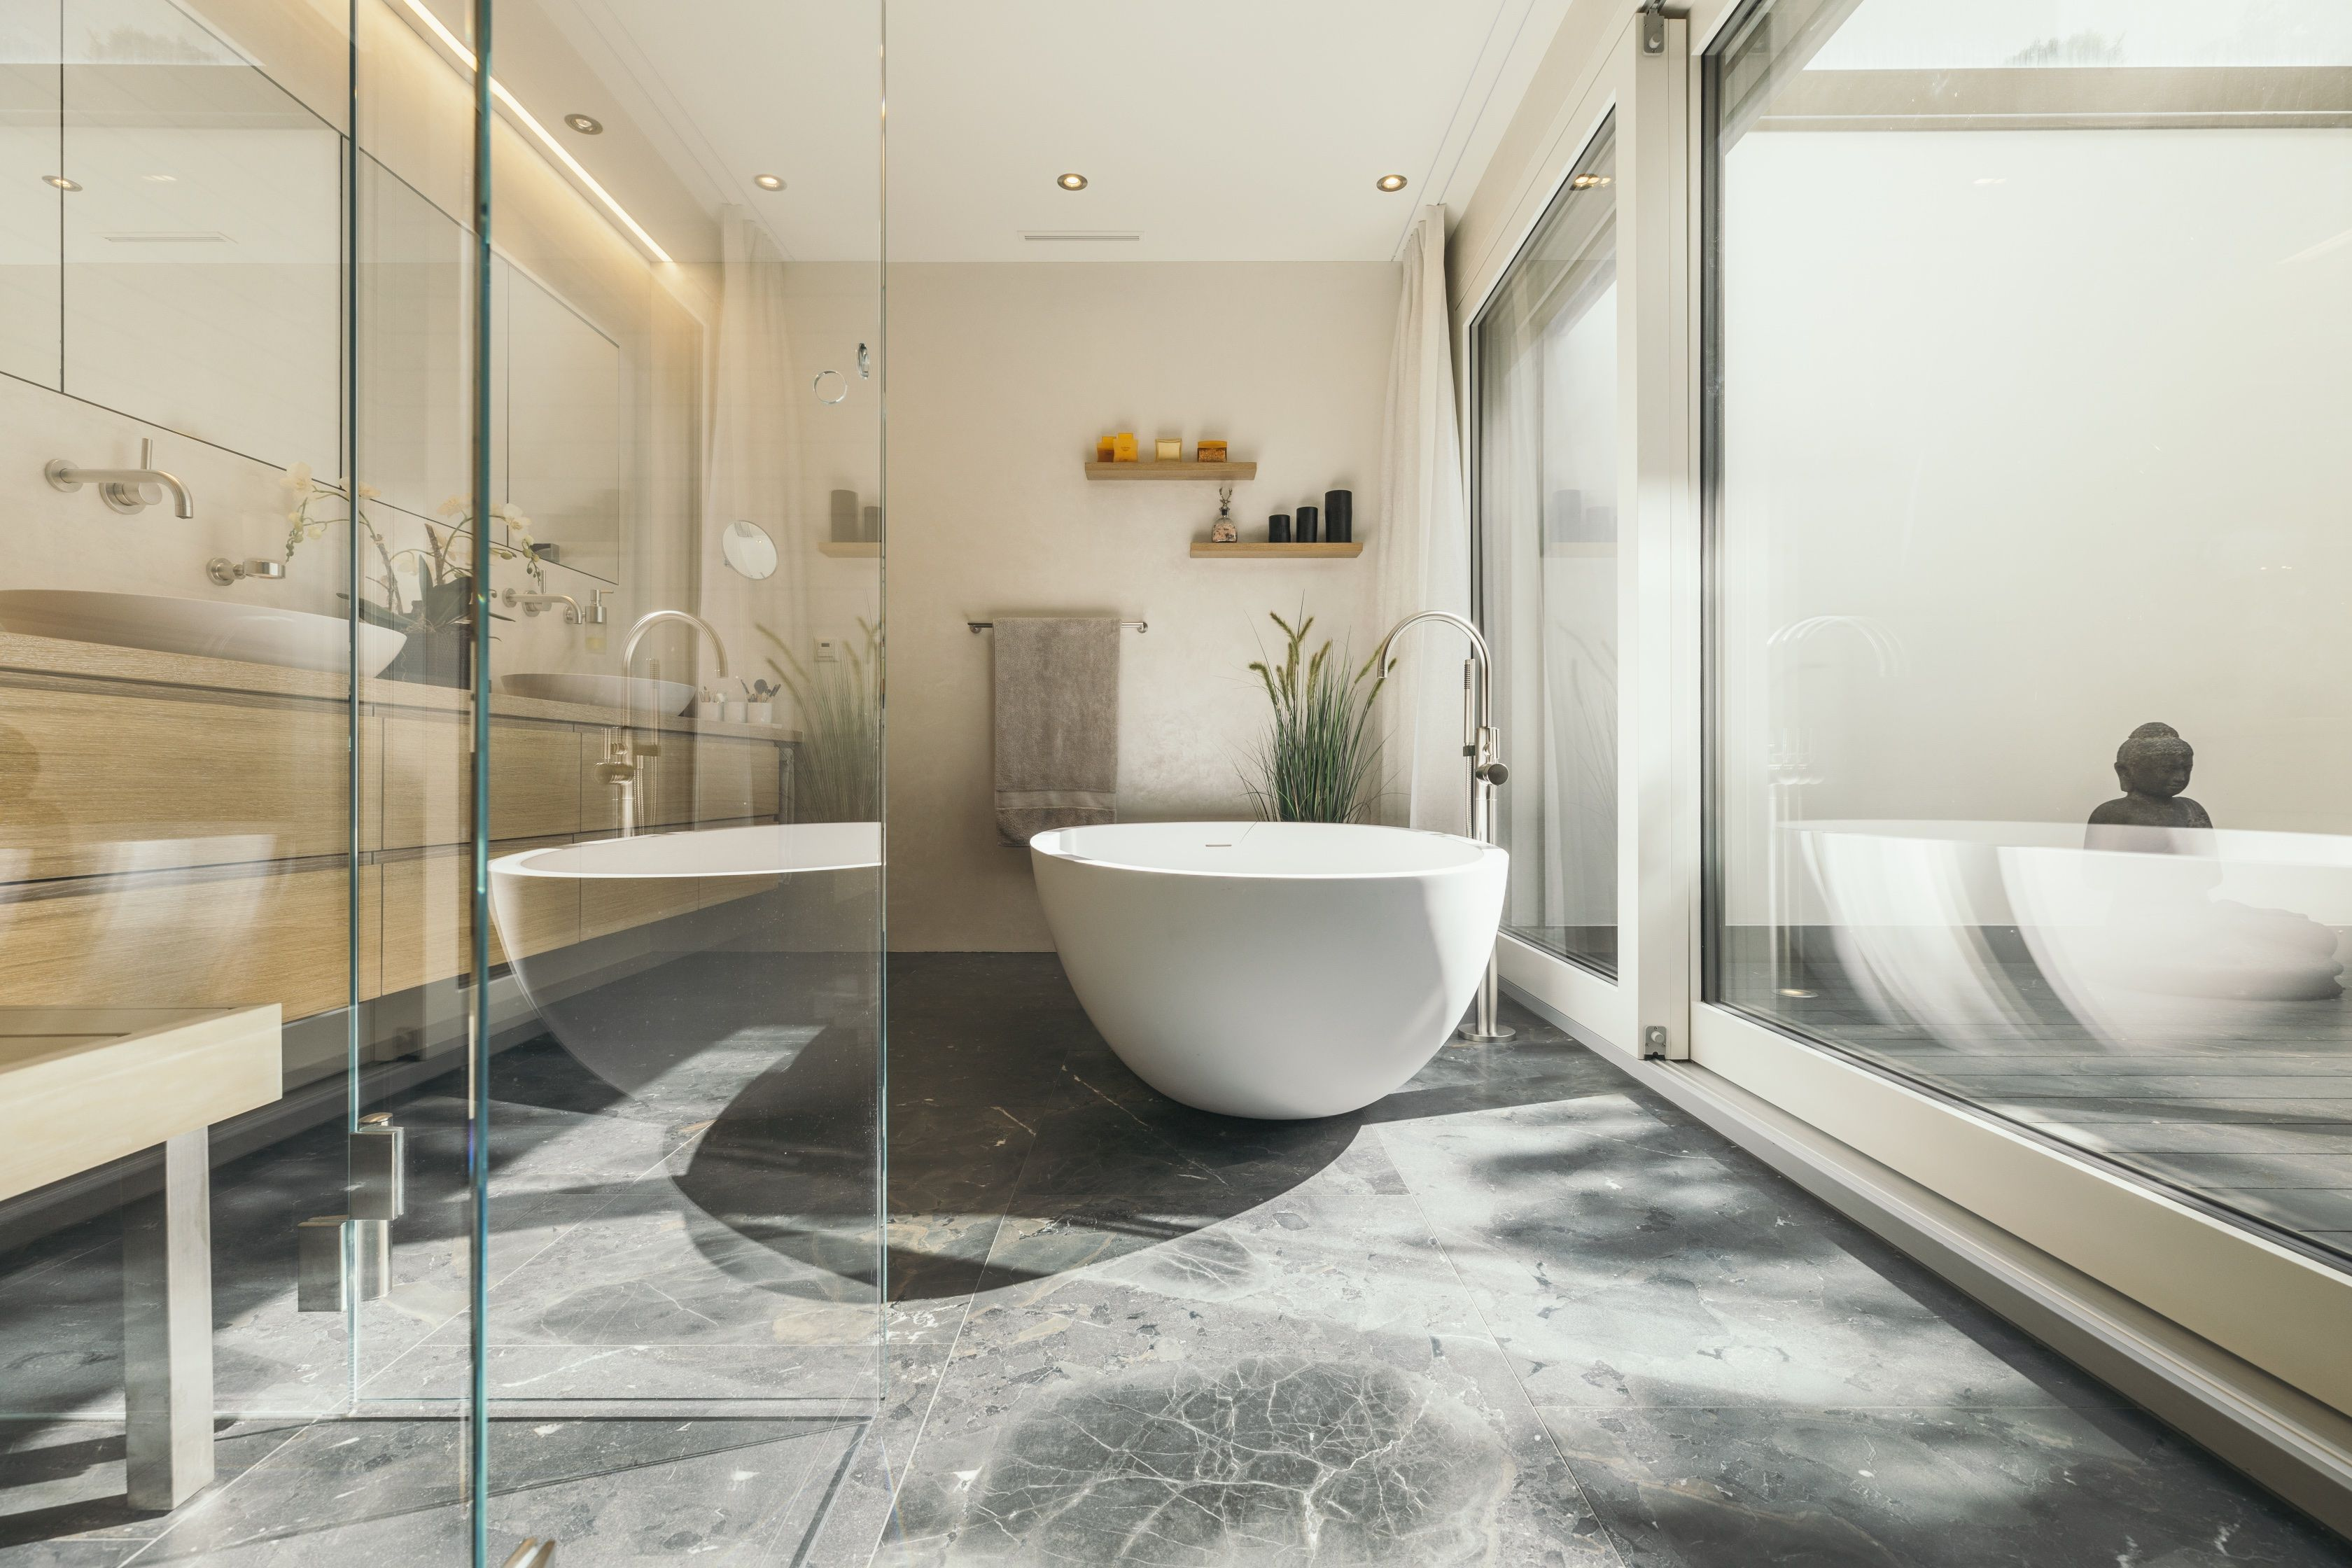 Badezimmer Artikel badezimmerartikel holz slagerijstok